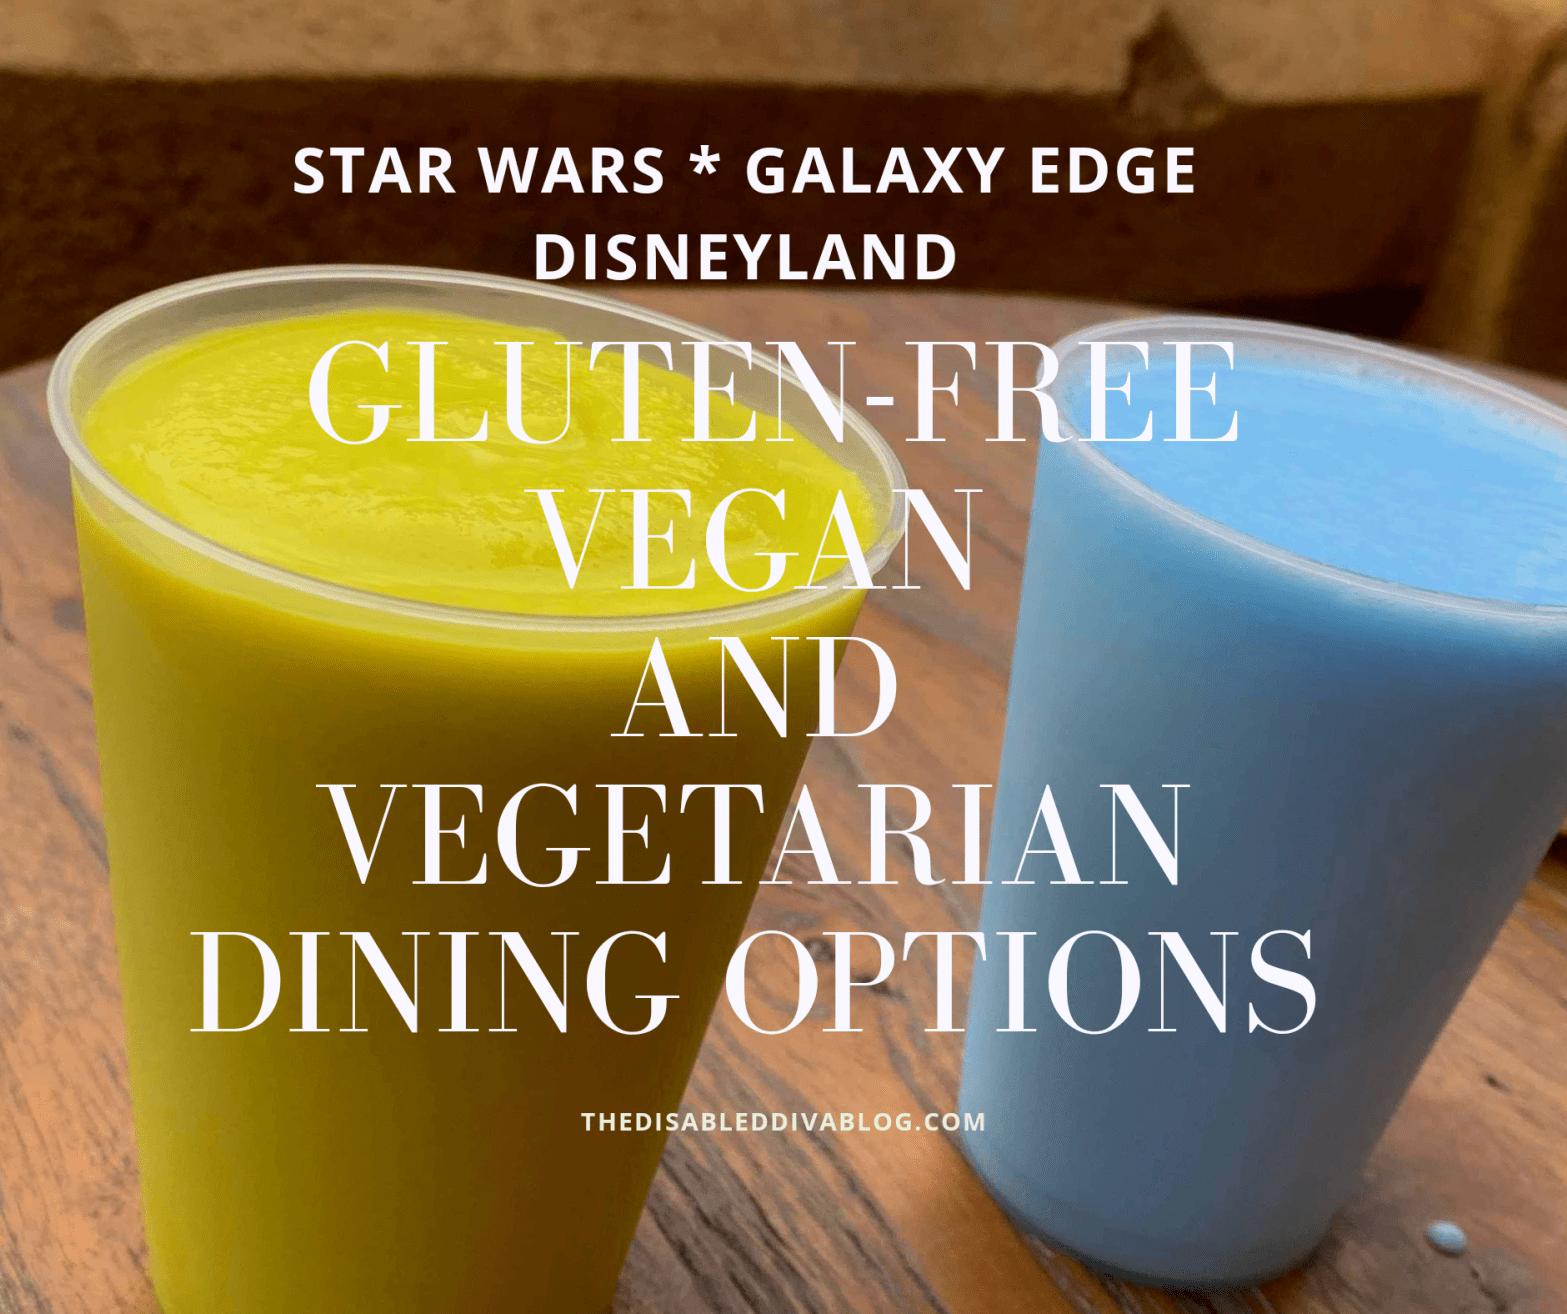 dining options for star wars galaxy edge Disneyland